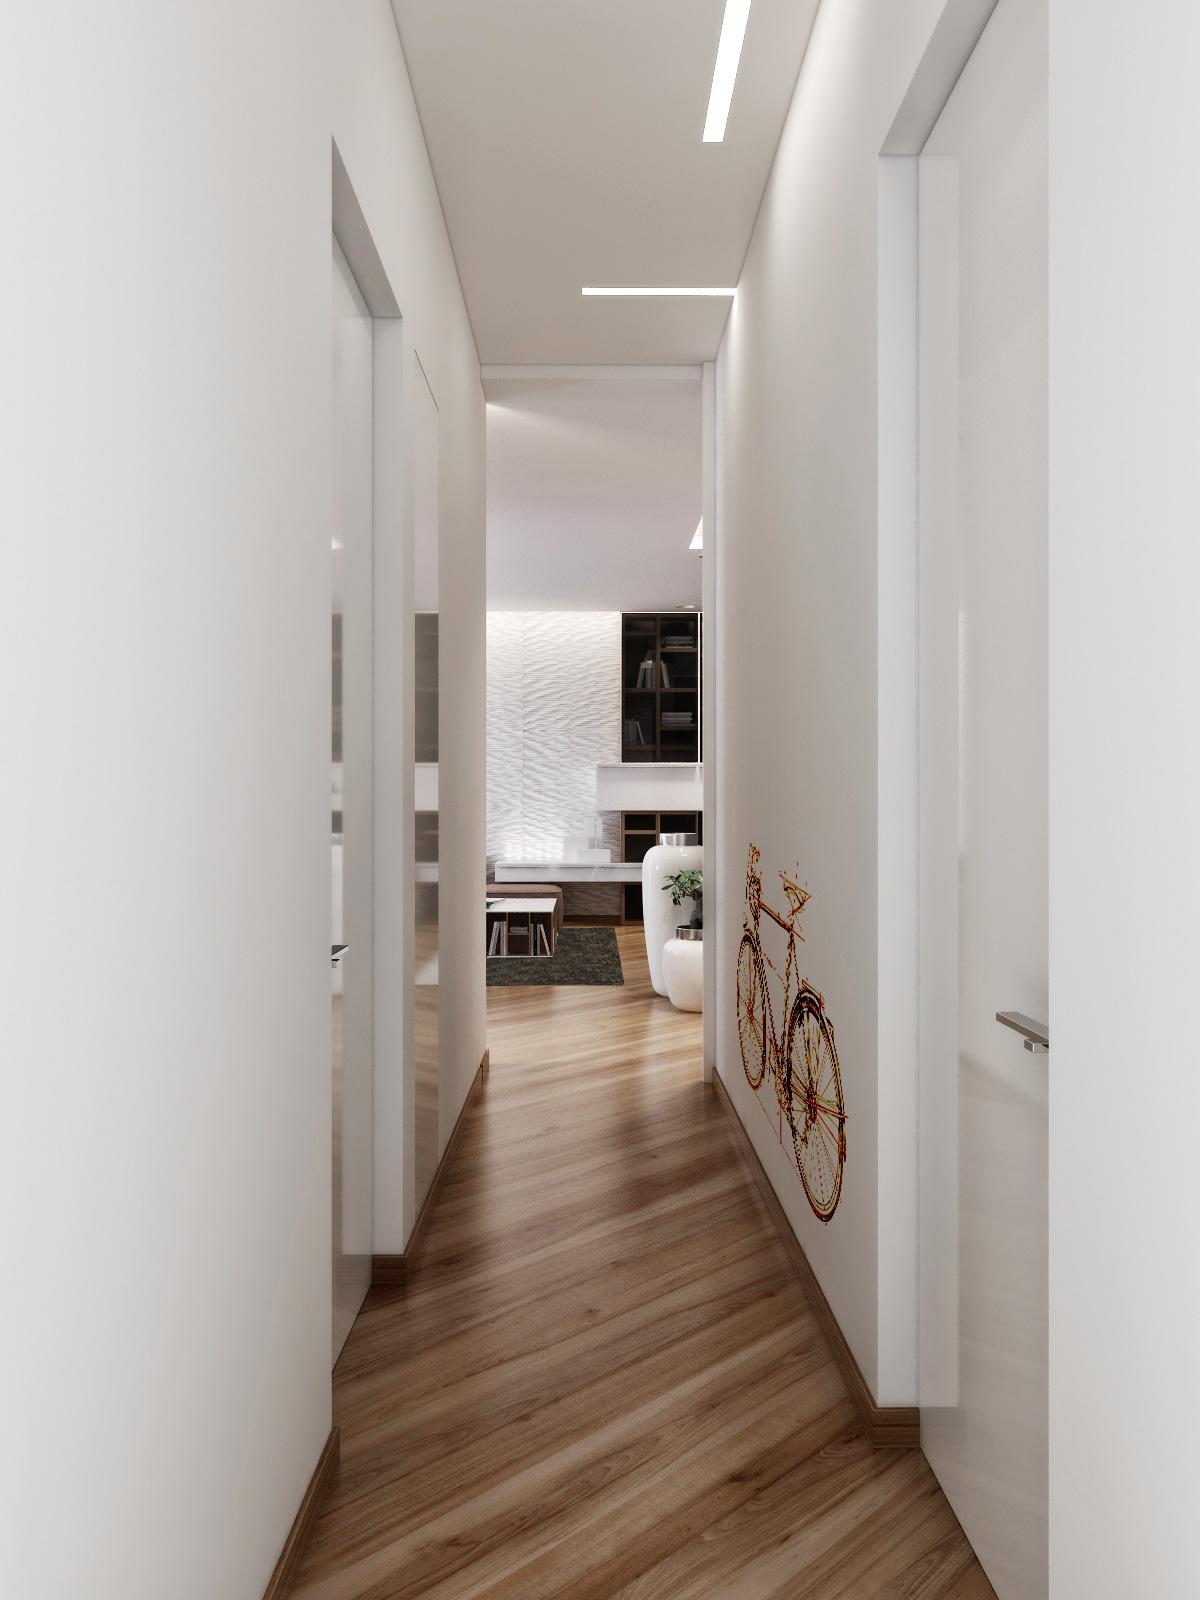 20+ Modern Home Corridor Design That Inspire You | Дизайн ... |House Corridors